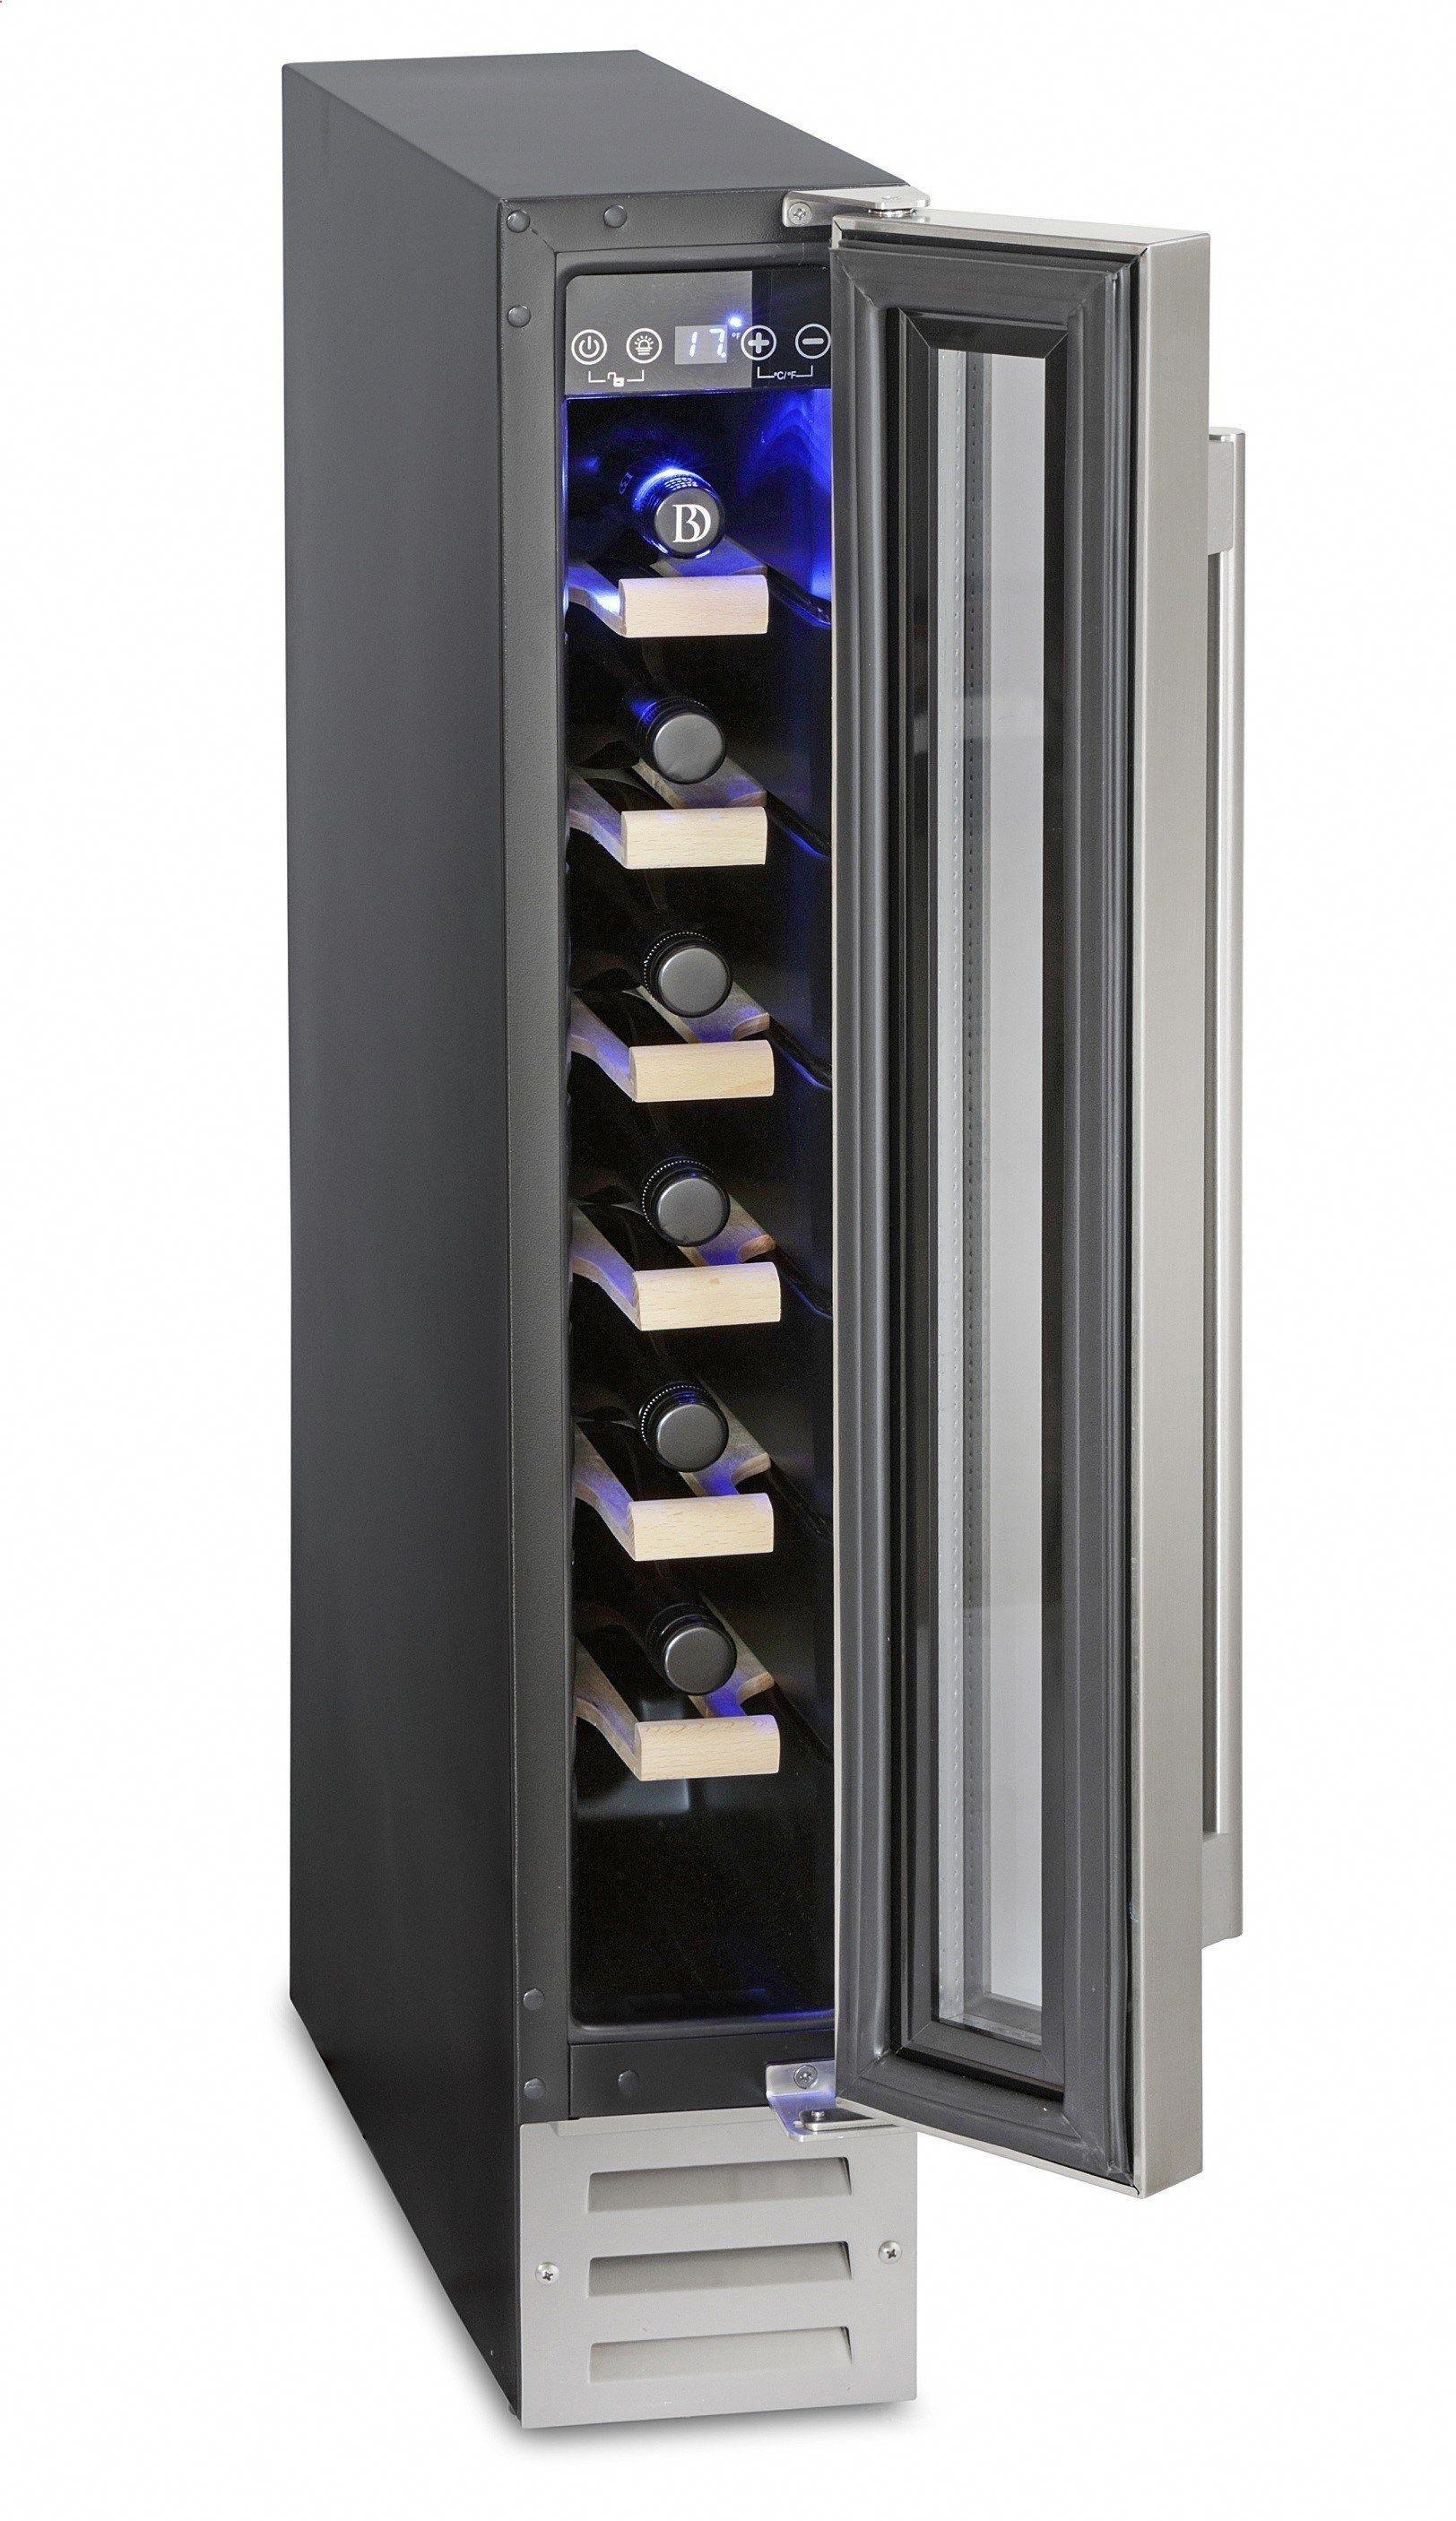 ItalianWine Wine fridge, Small wine fridge, Wine